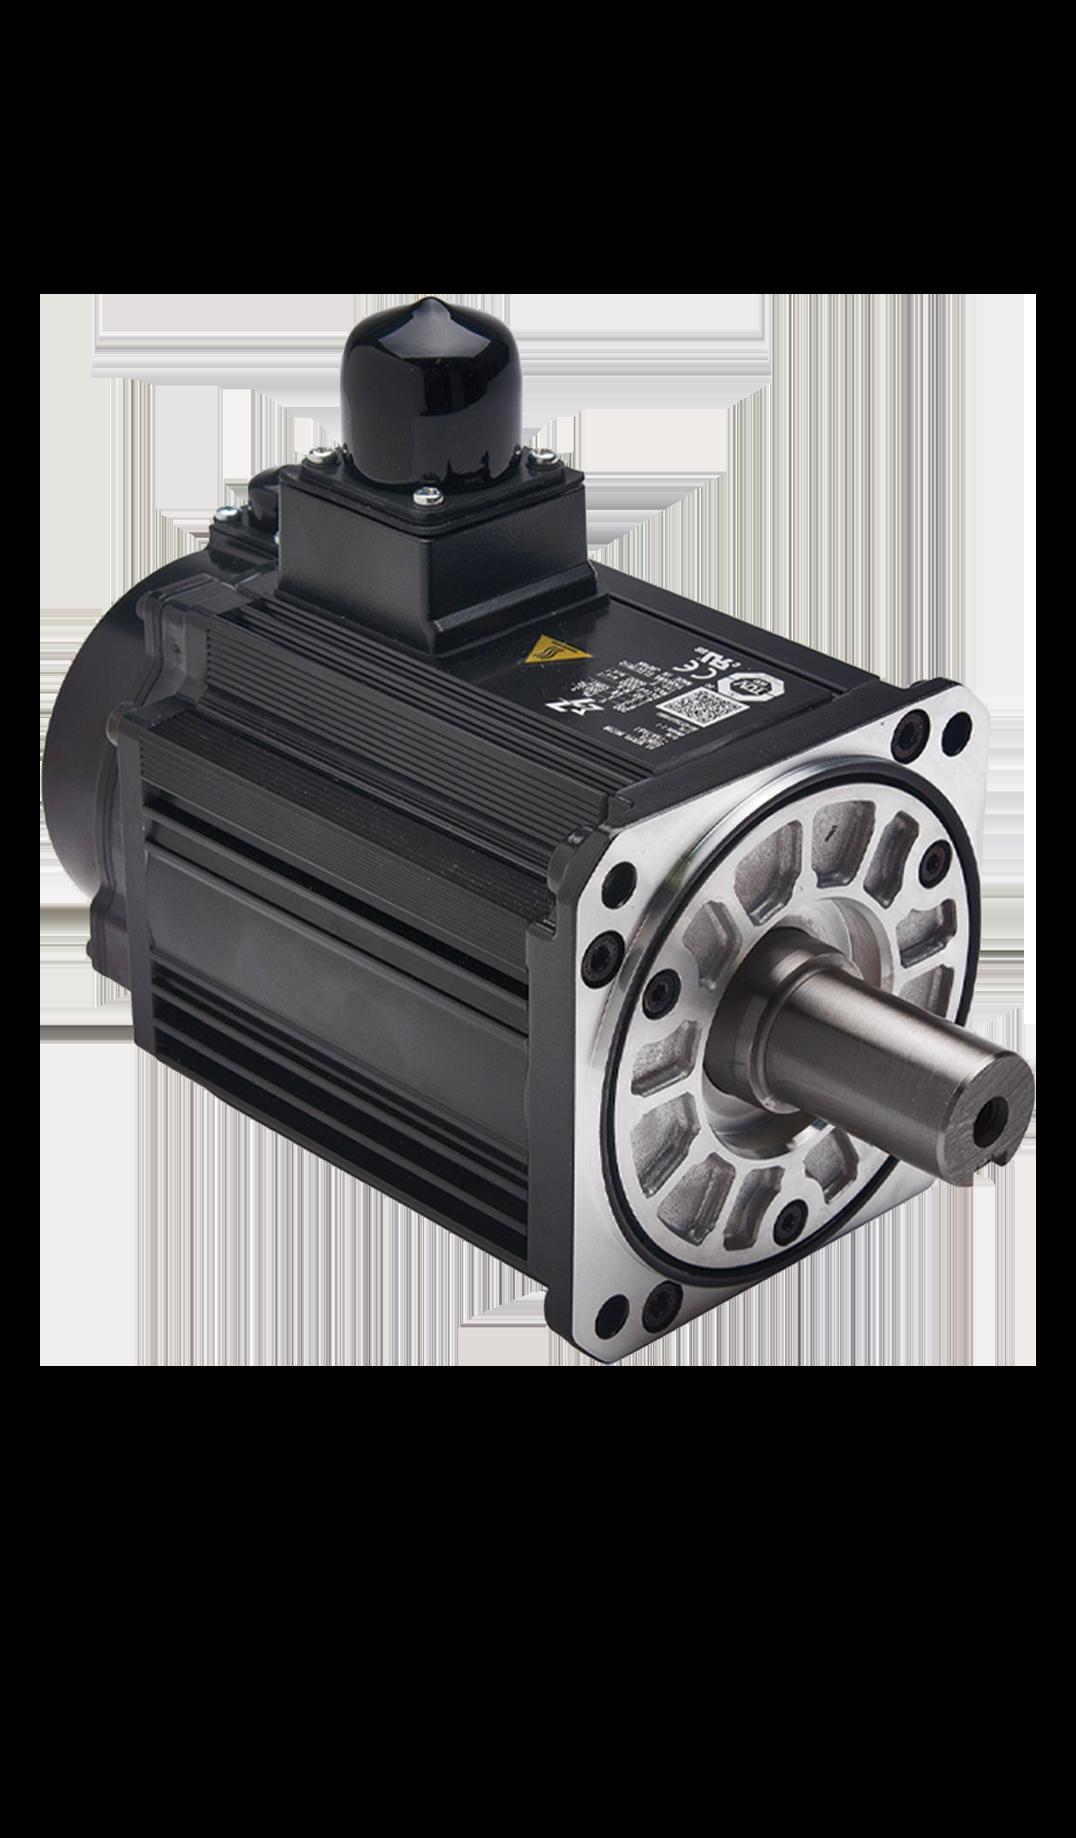 Yaskawa rotary servo motors